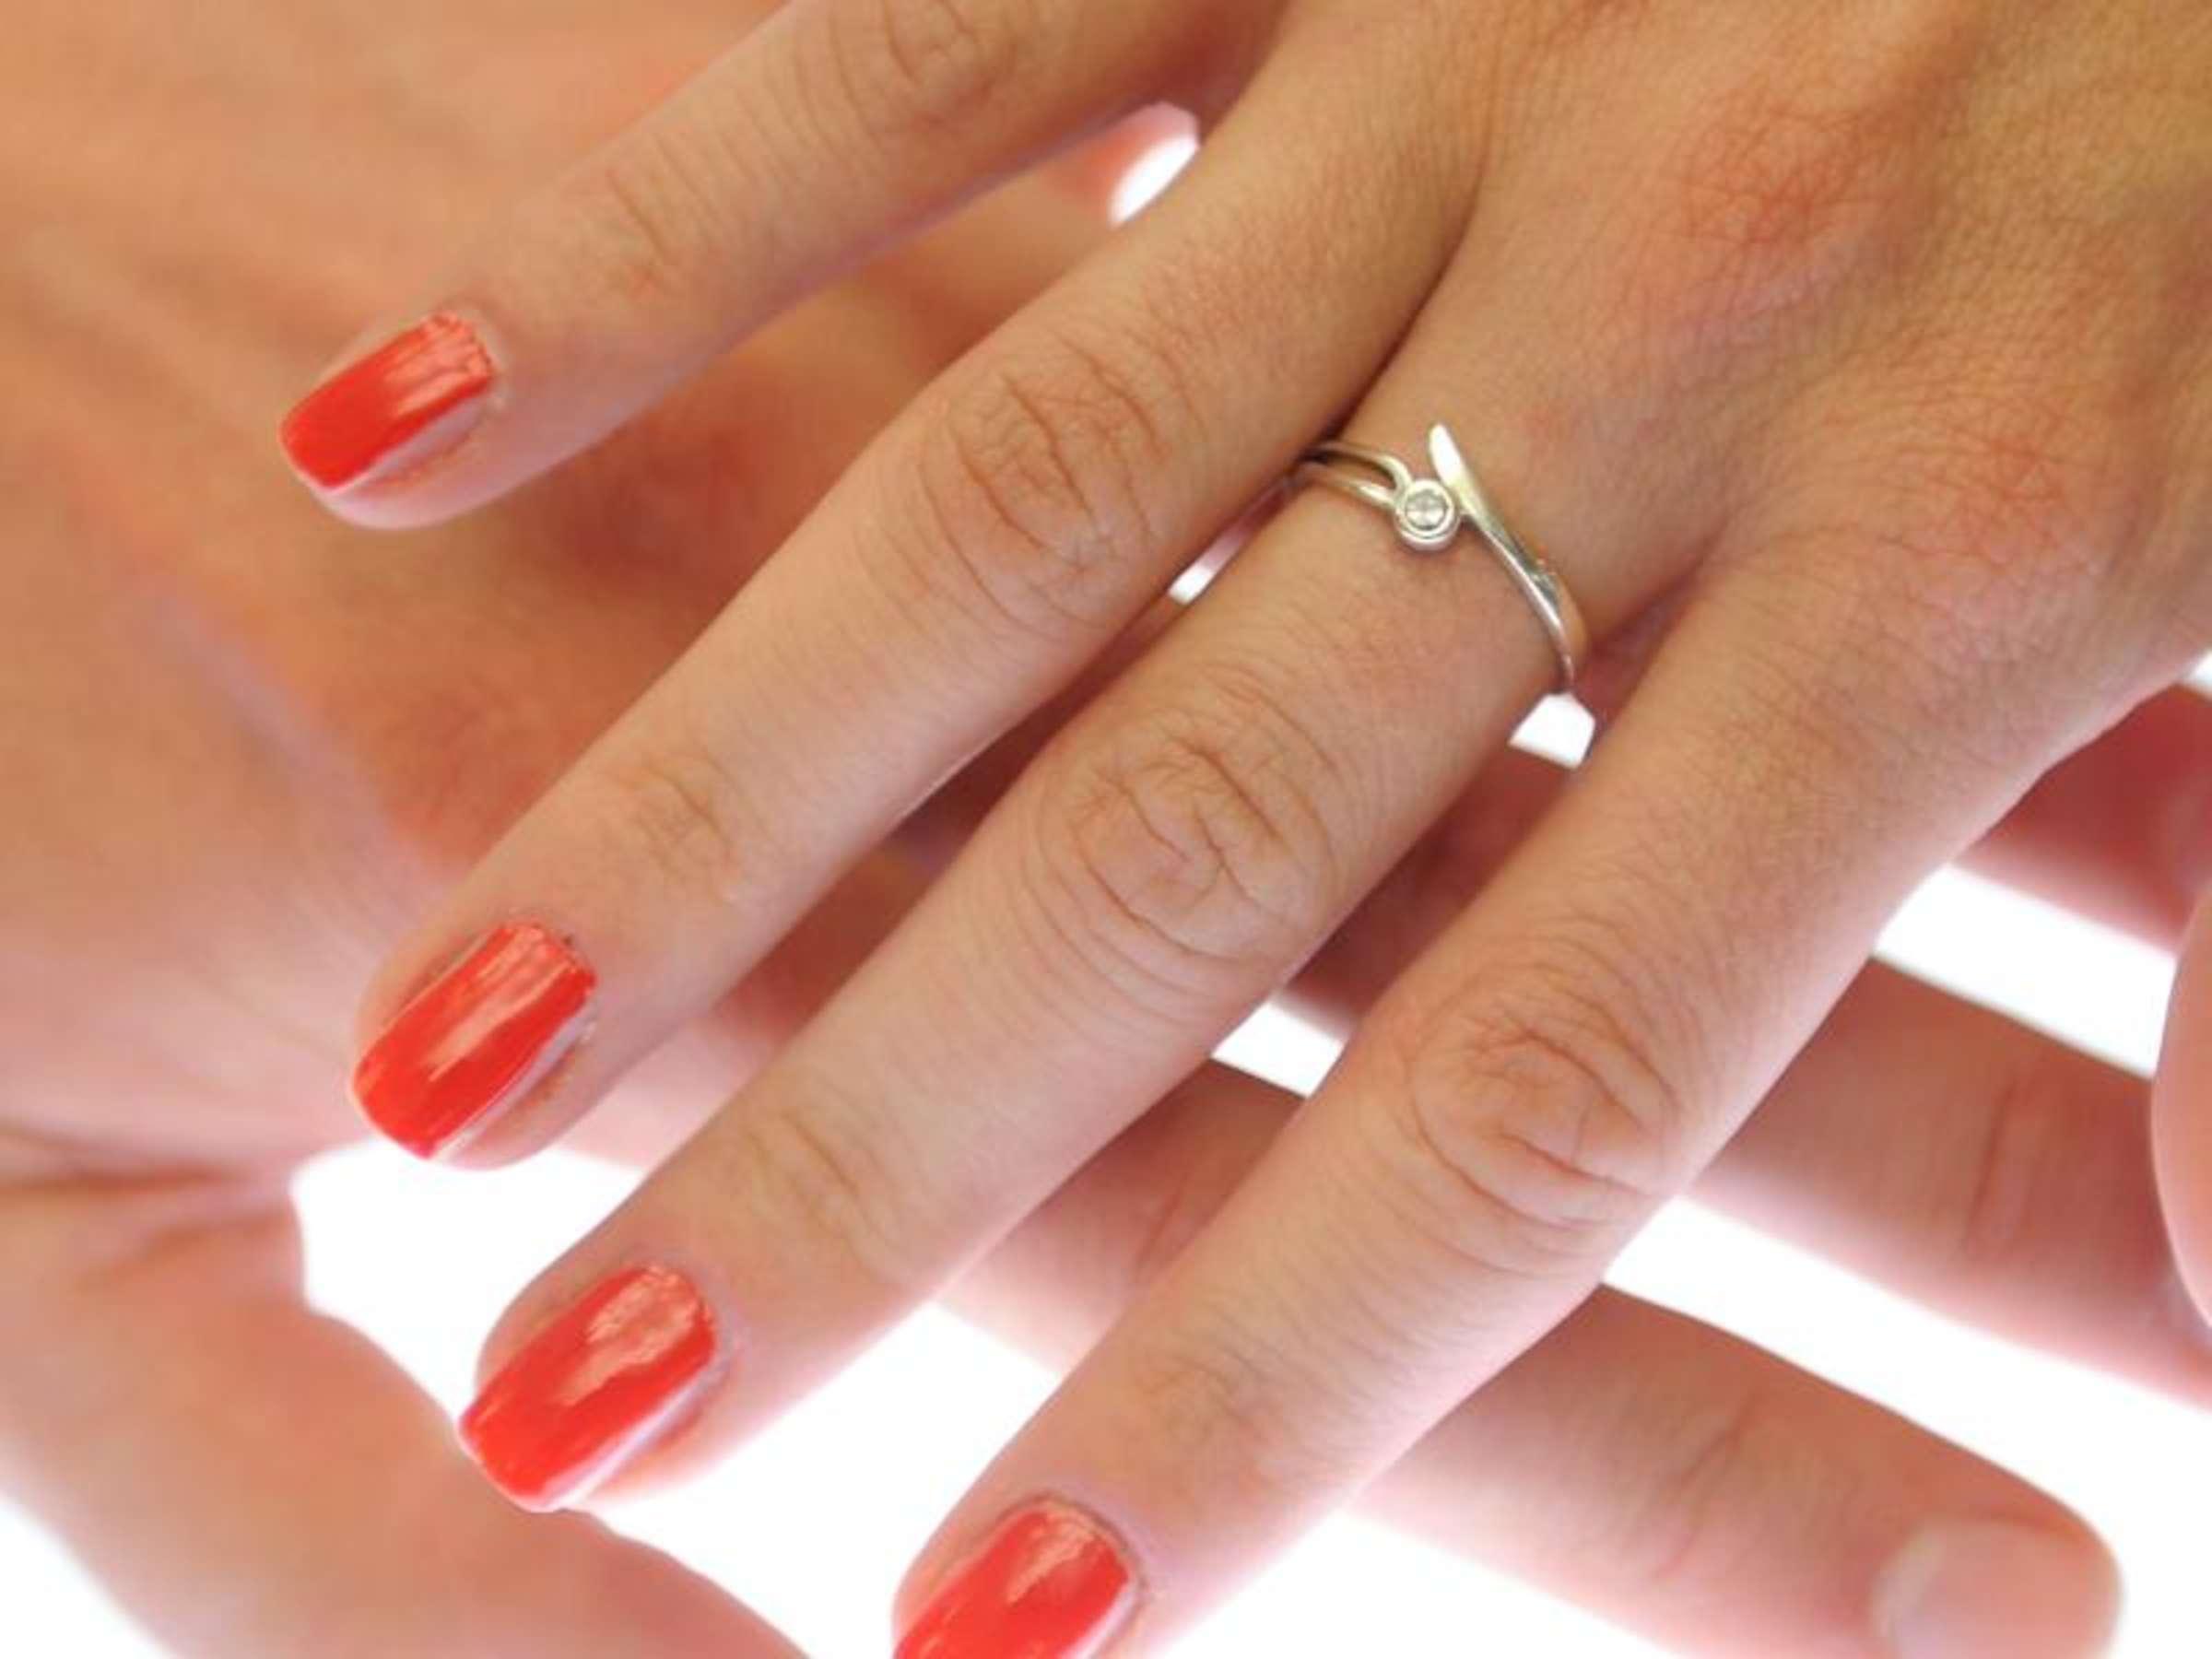 Am finger knubbel Ganglion: So